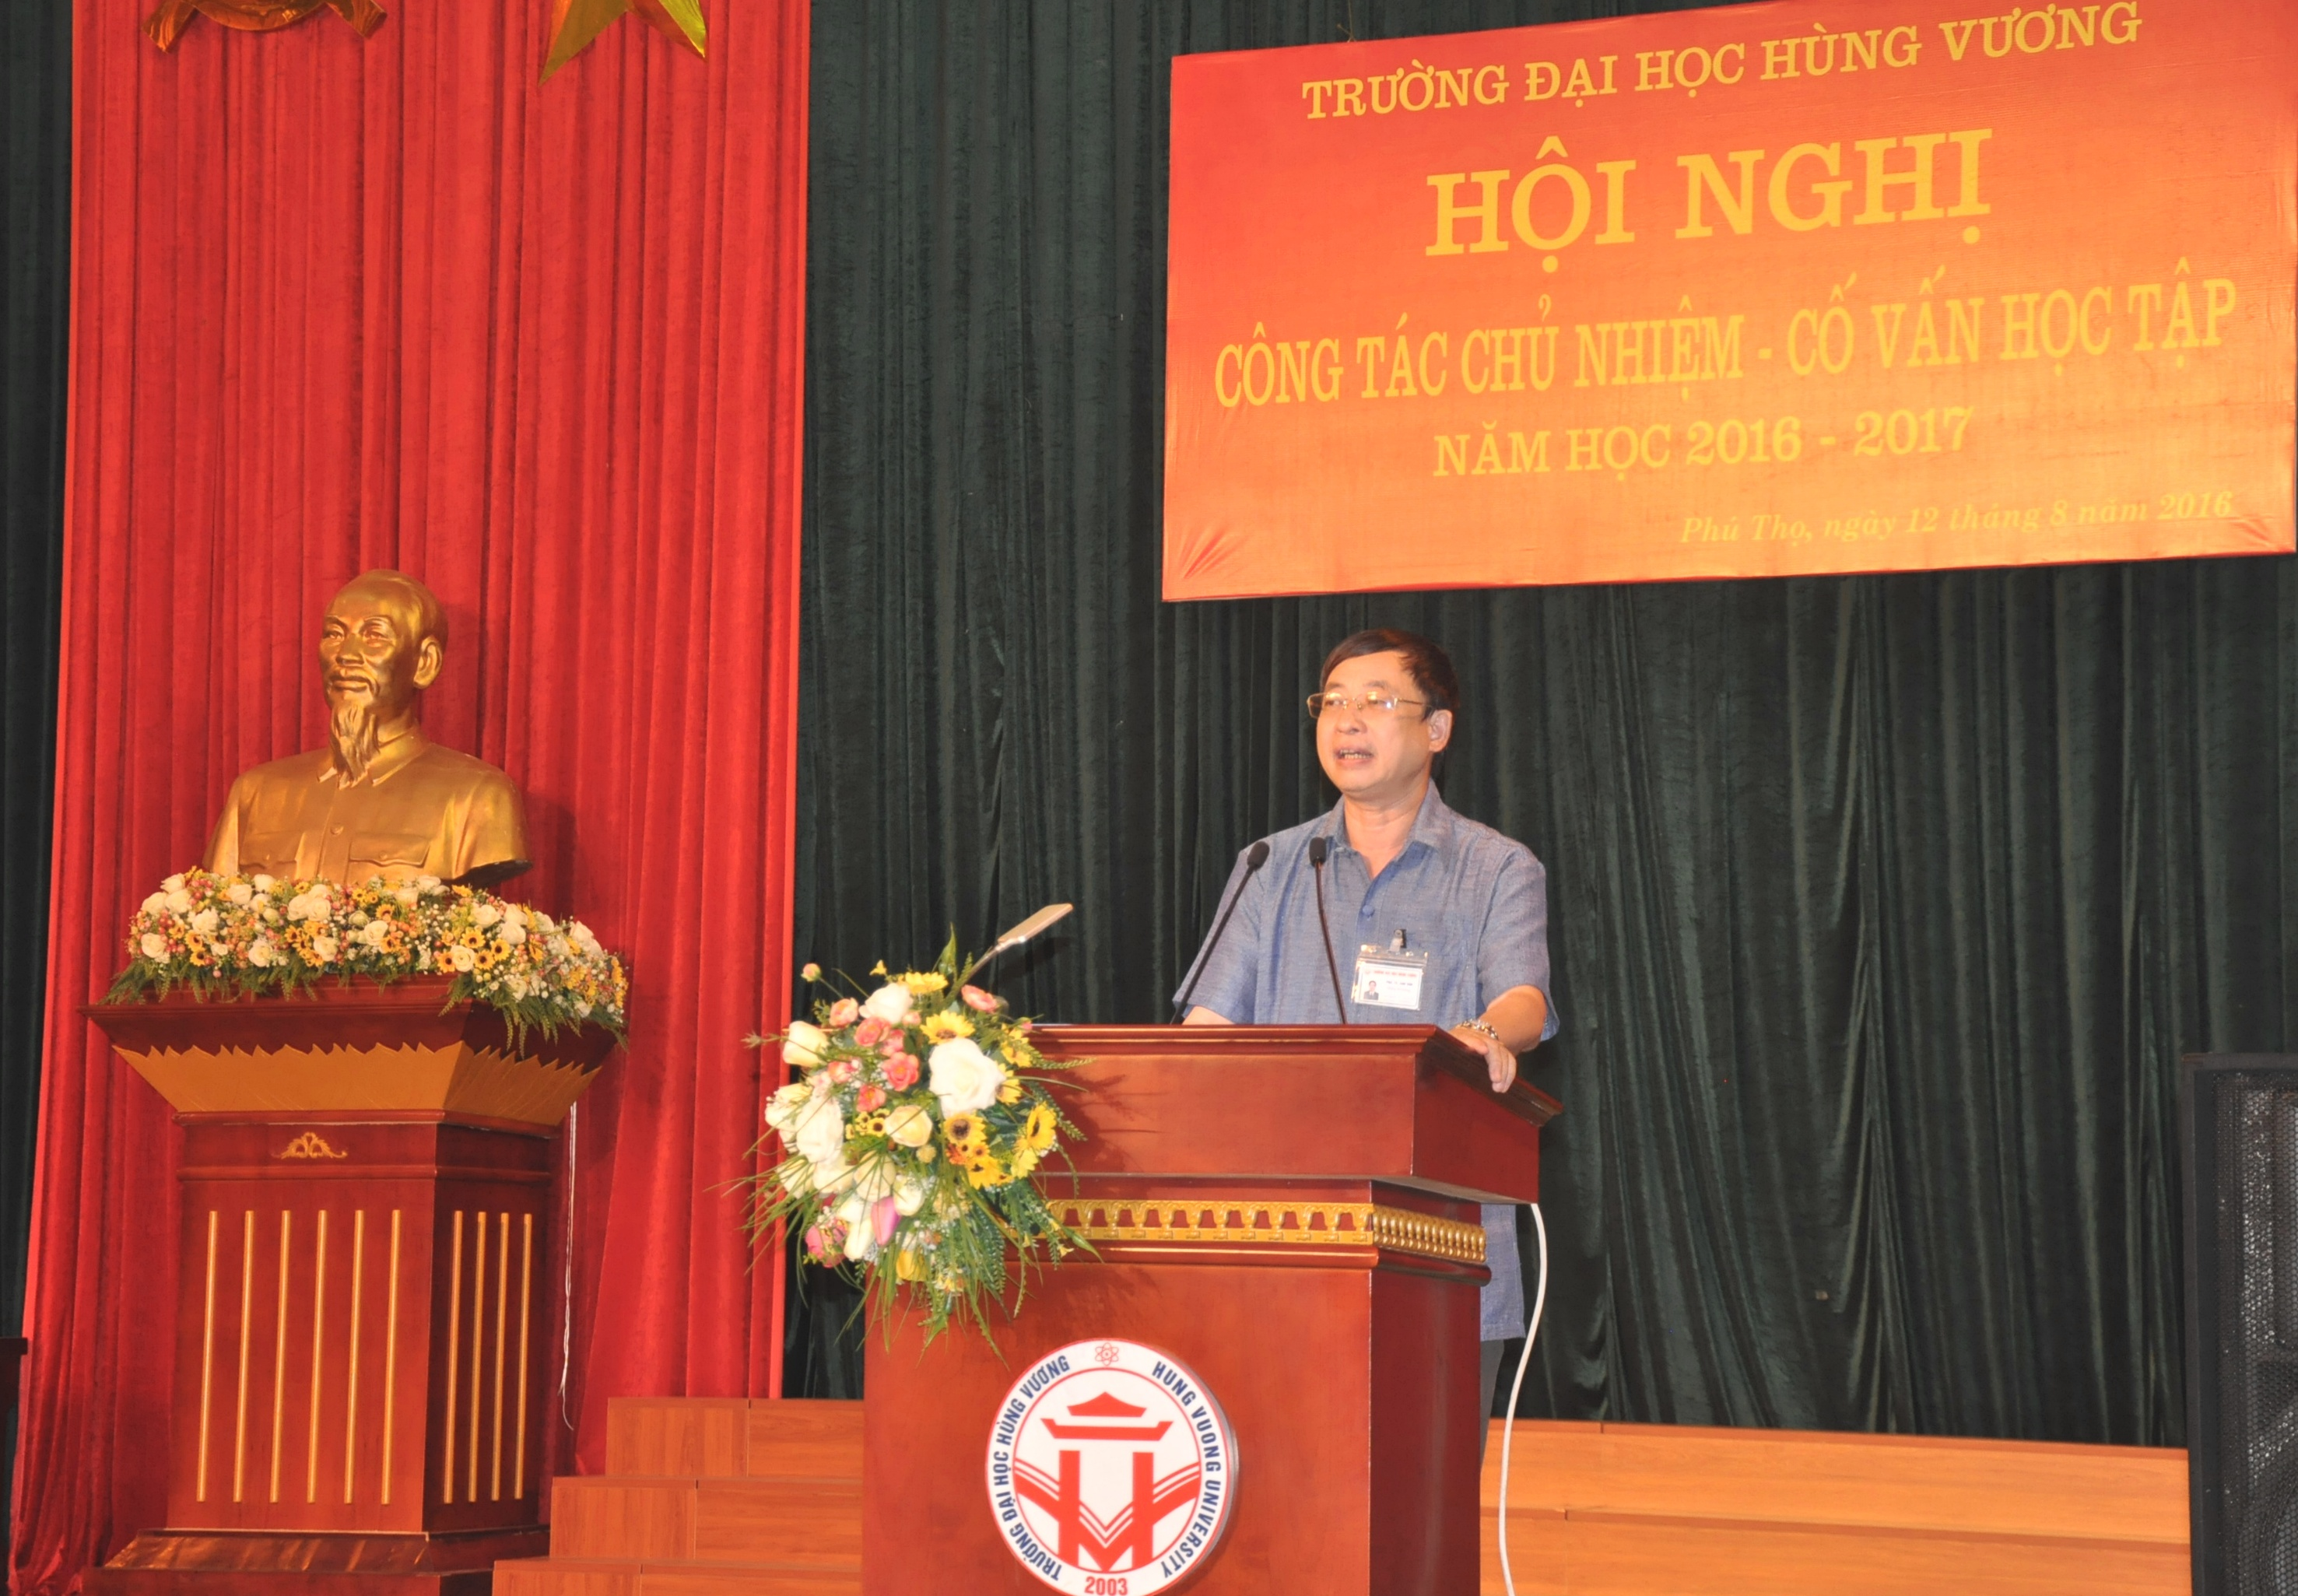 Truong Dai hoc Hung Vuong to chuc hoi nghi cong tac chu nhiem – co van hoc tap nam hoc 2016 – 2017